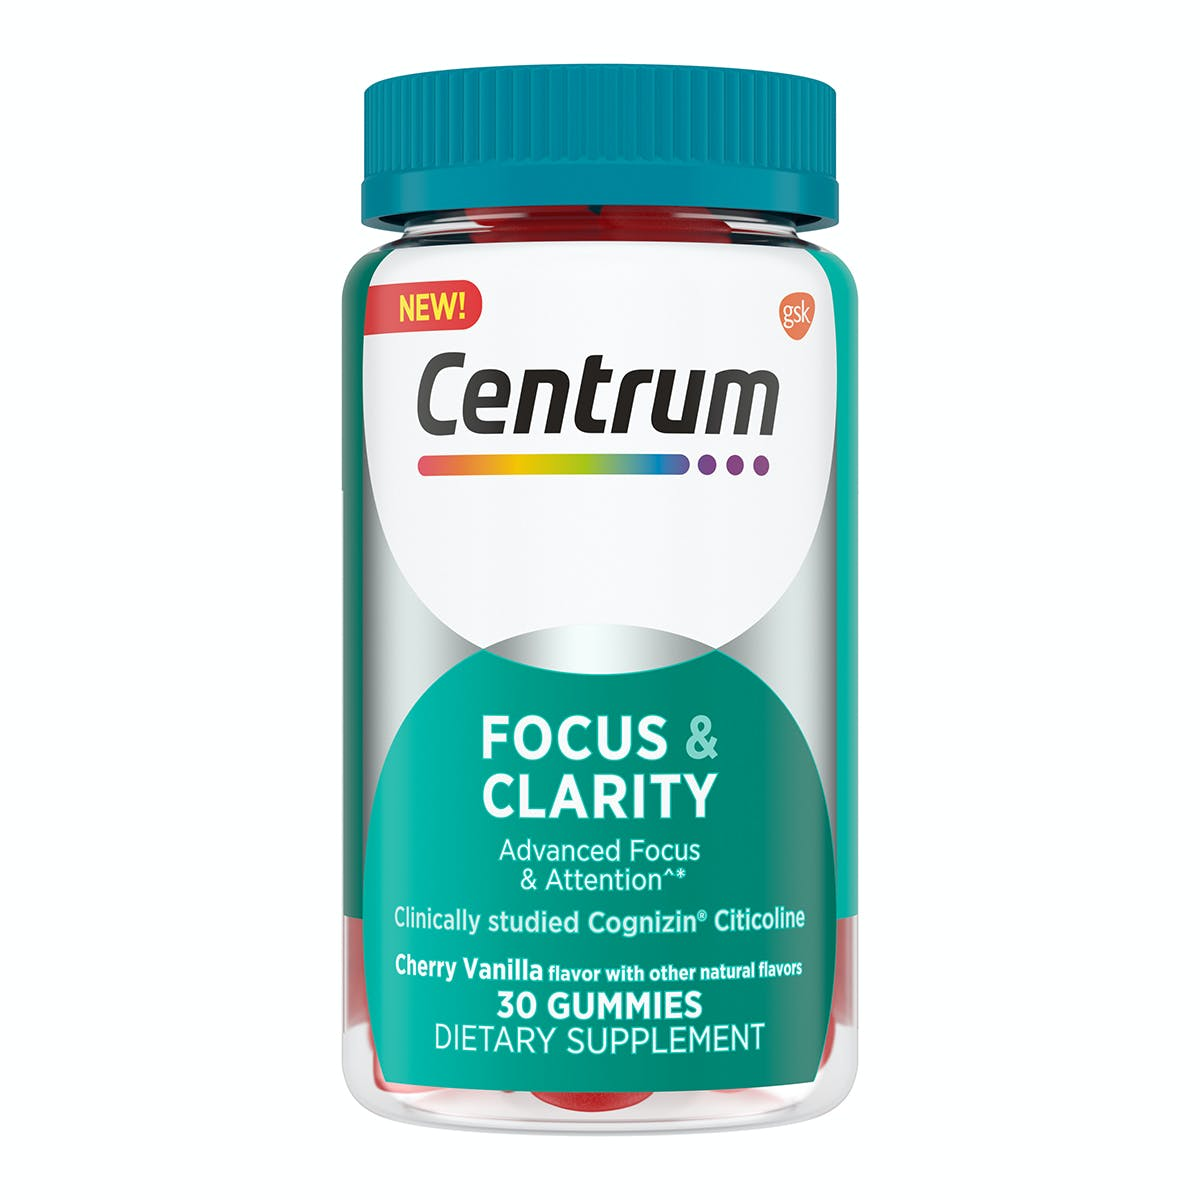 Bottle of Centrum Adult Gummy Focus & Clarity Supplements